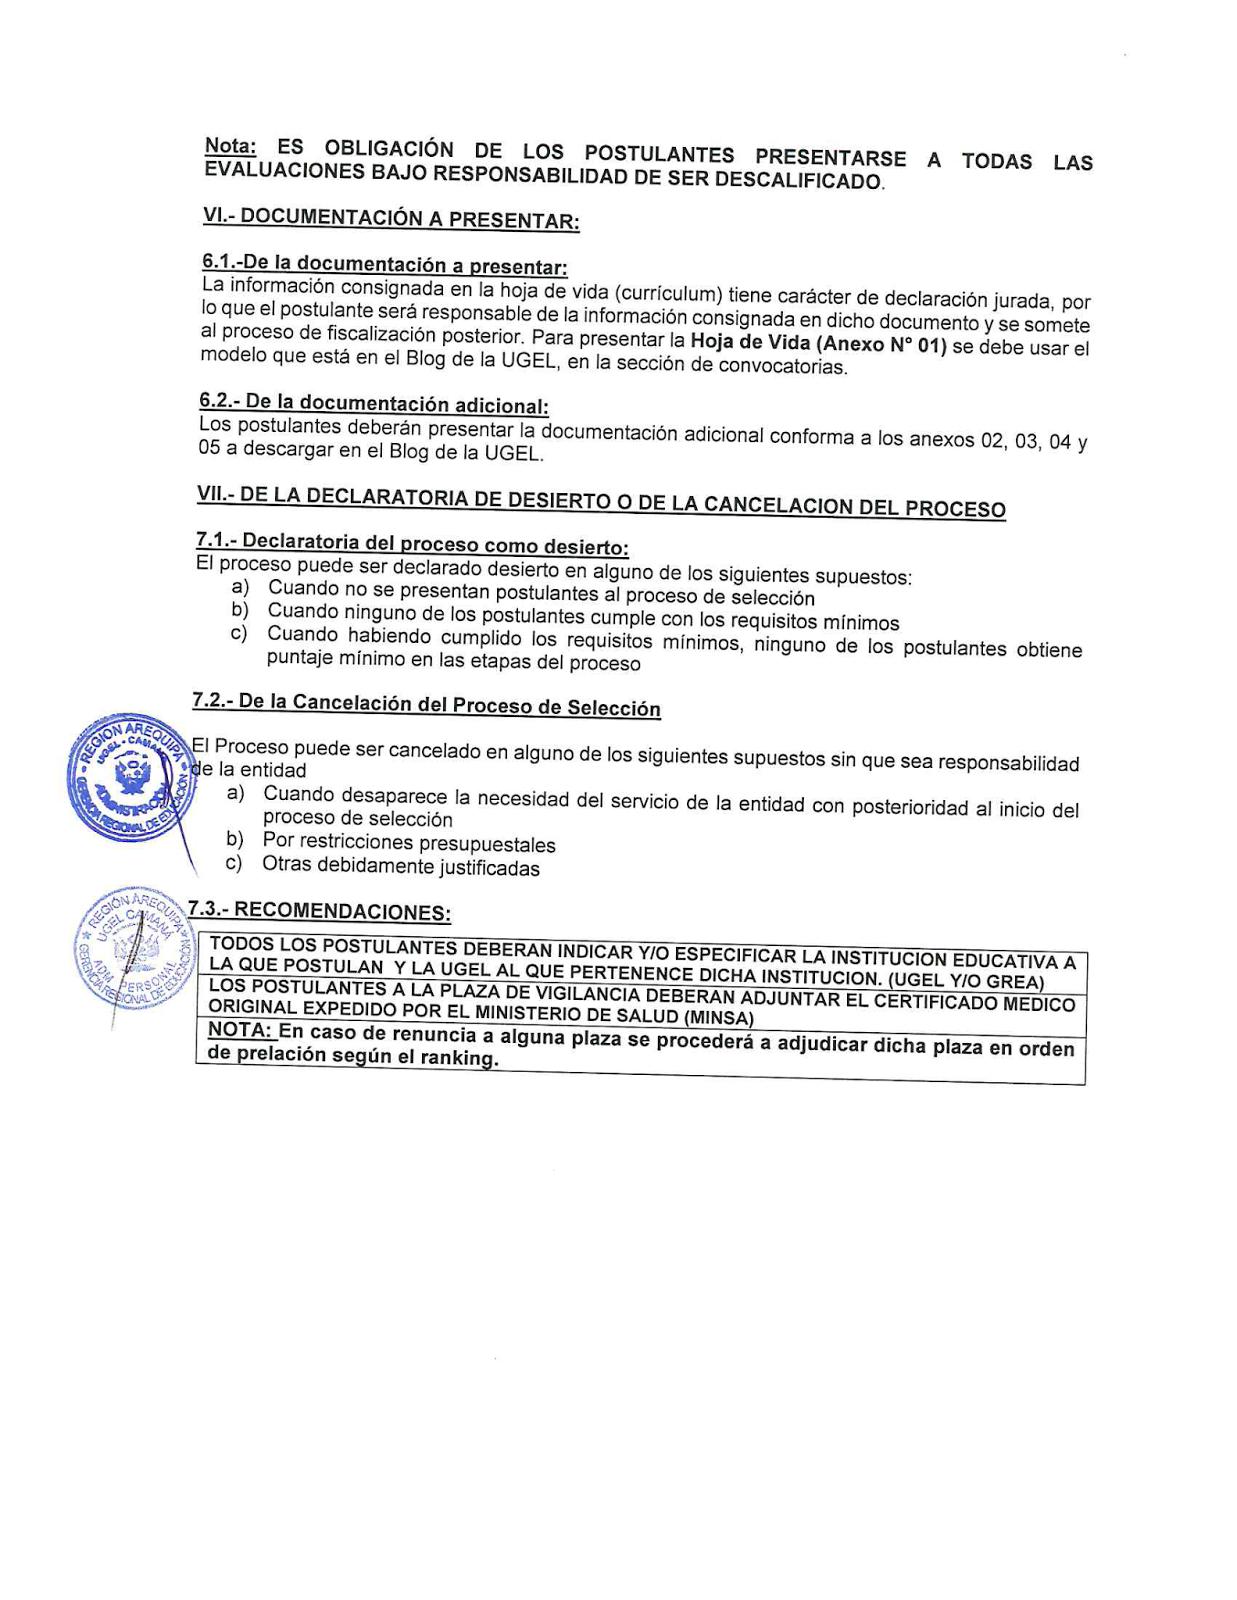 Convocatoria cas para especialista en finanzas ugel for Convocatoria para docentes